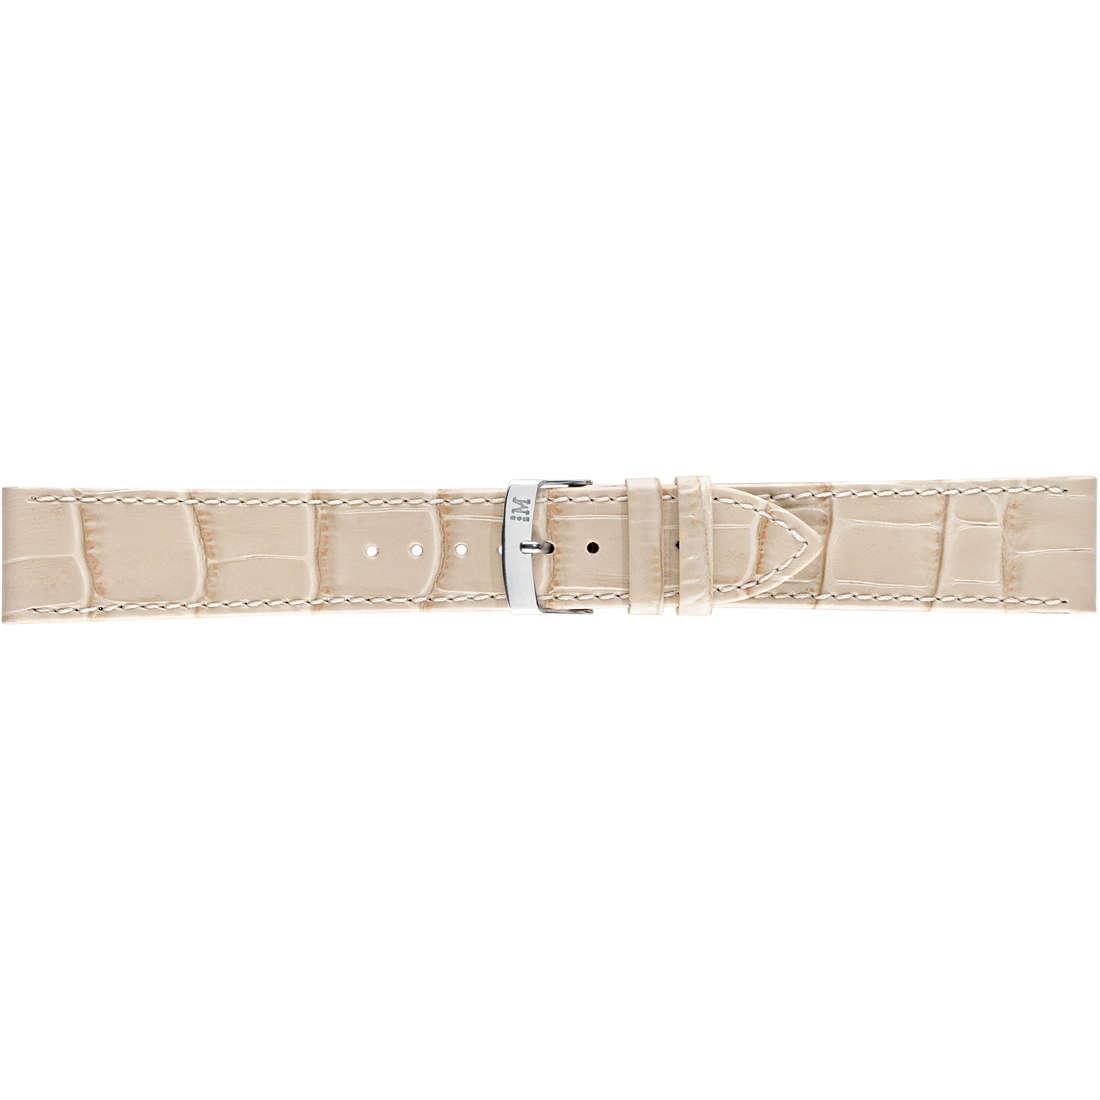 watch watch bands watch straps man Morellato Performance A01X2524656326CR20